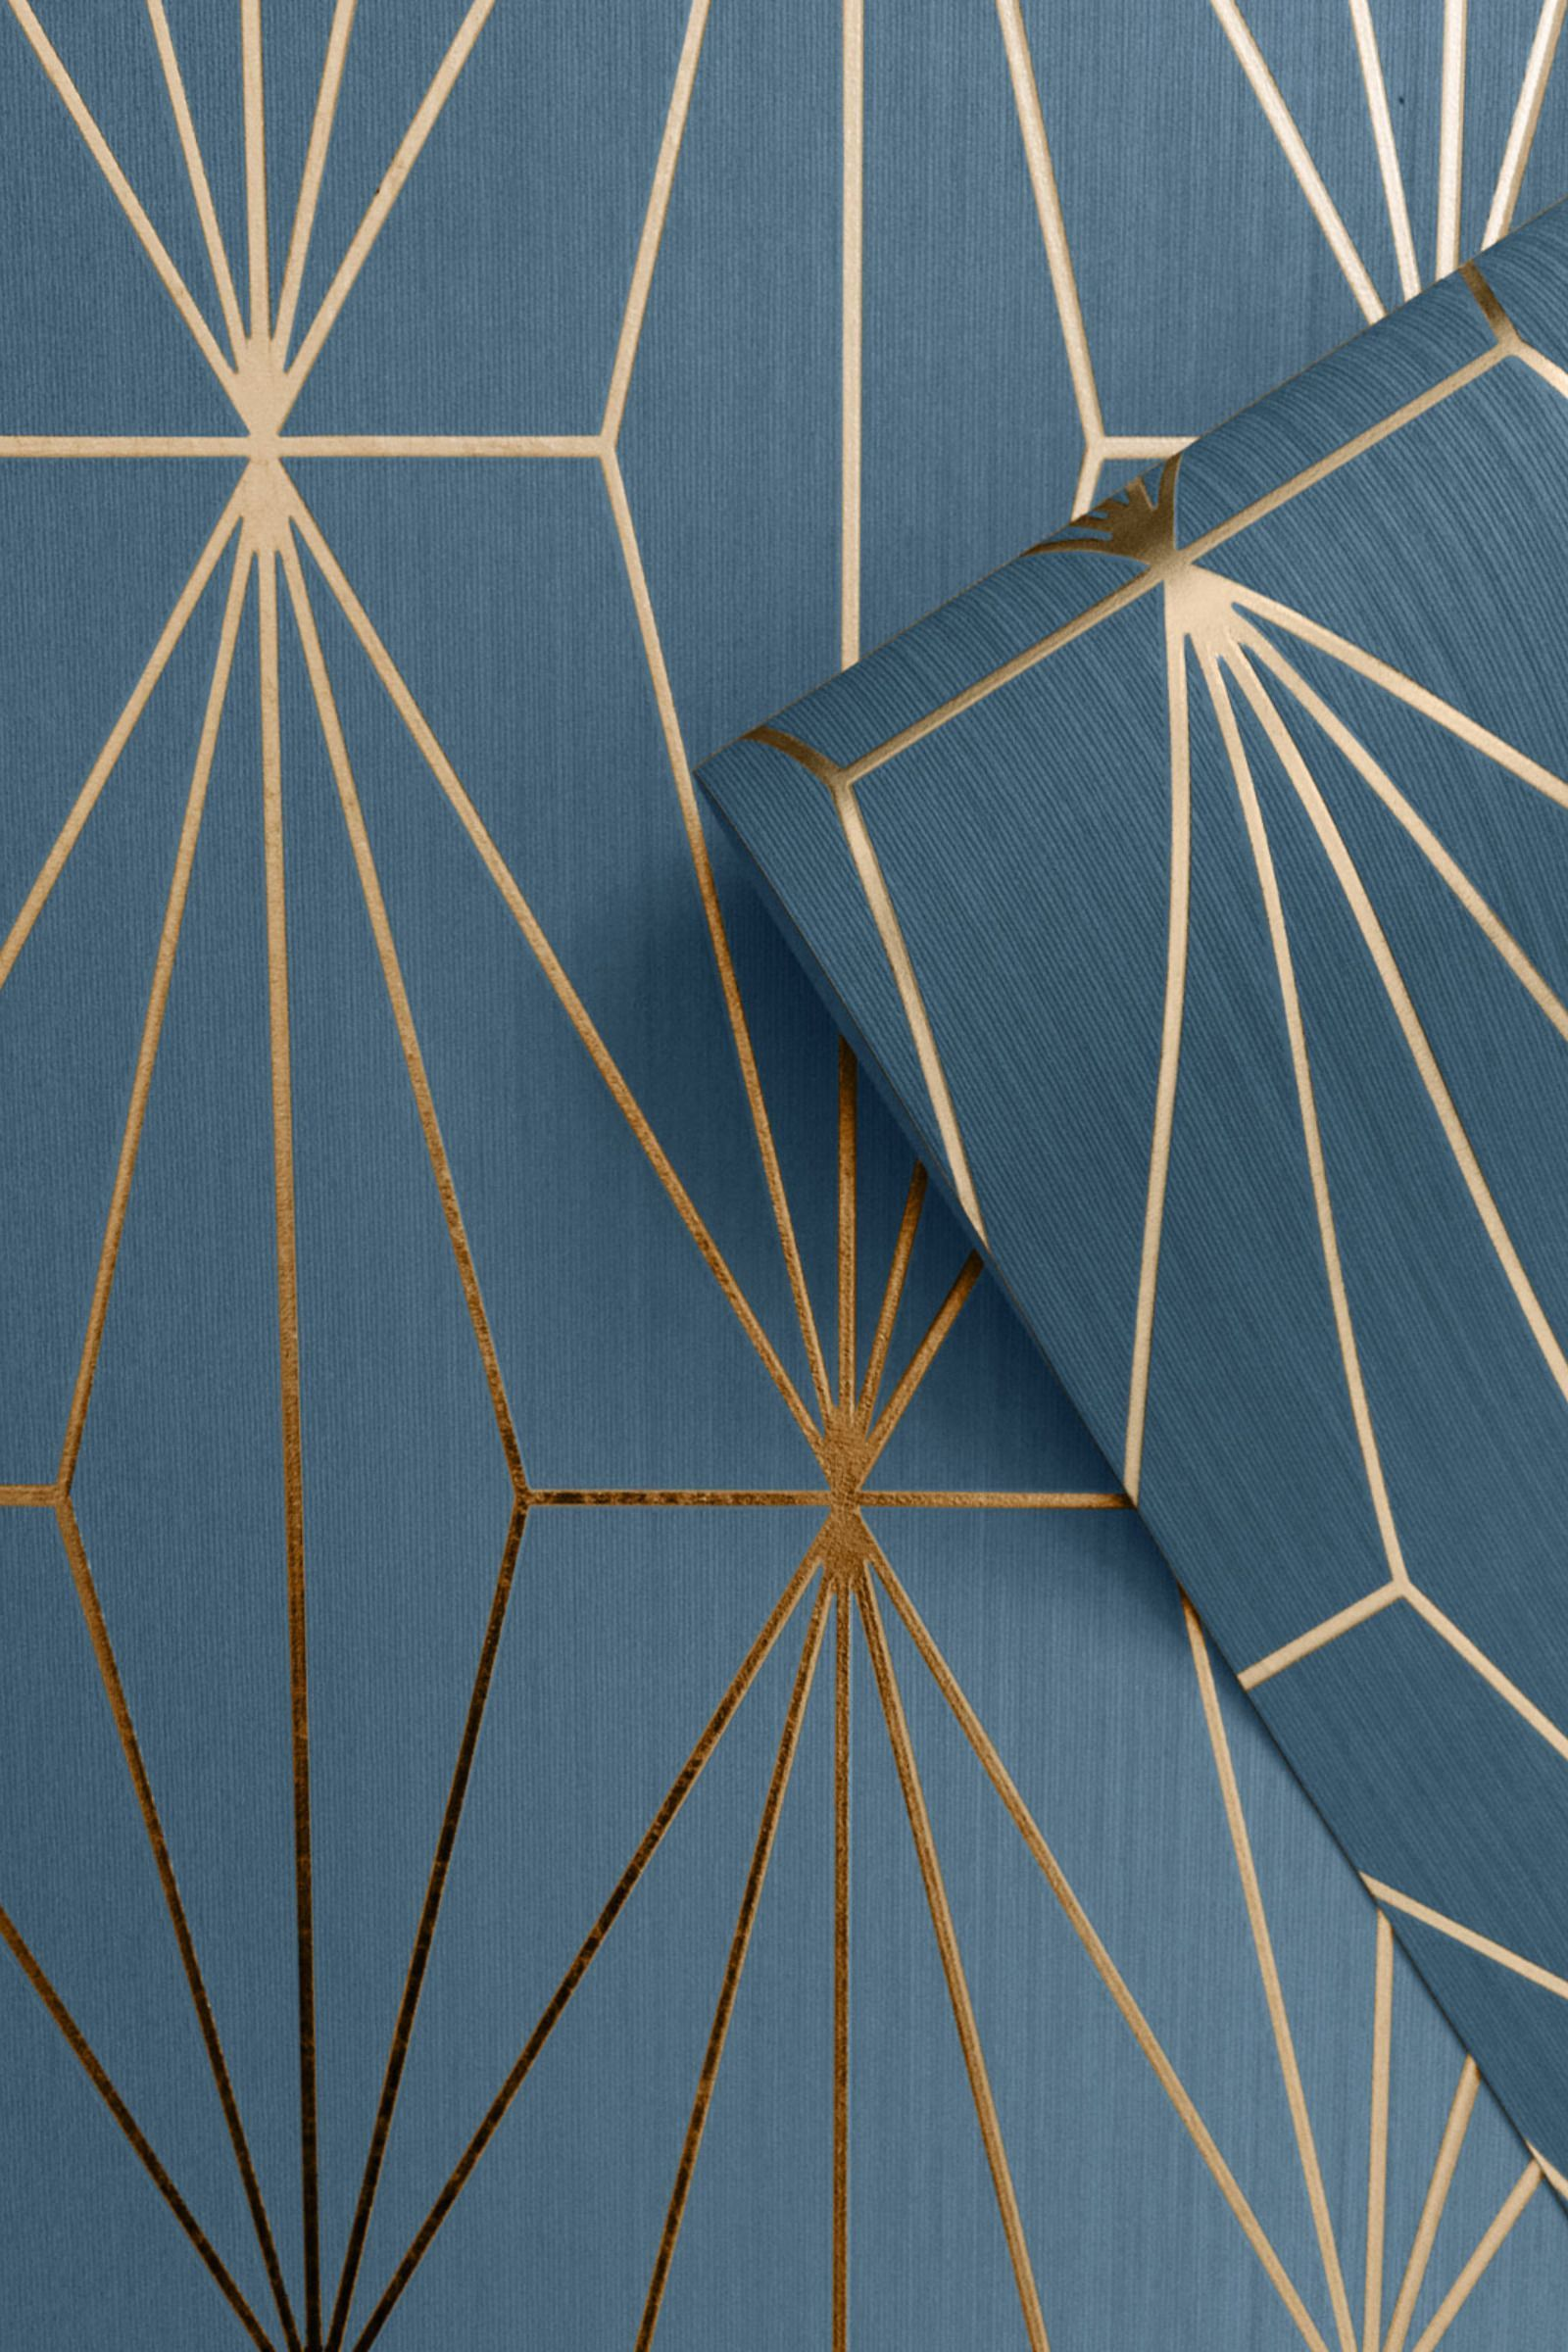 Kayla Metallic Geometric Wallpaper Blue Bronze In 2020 Geometric Wallpaper Feature Wall Wallpaper Art Deco Wallpaper